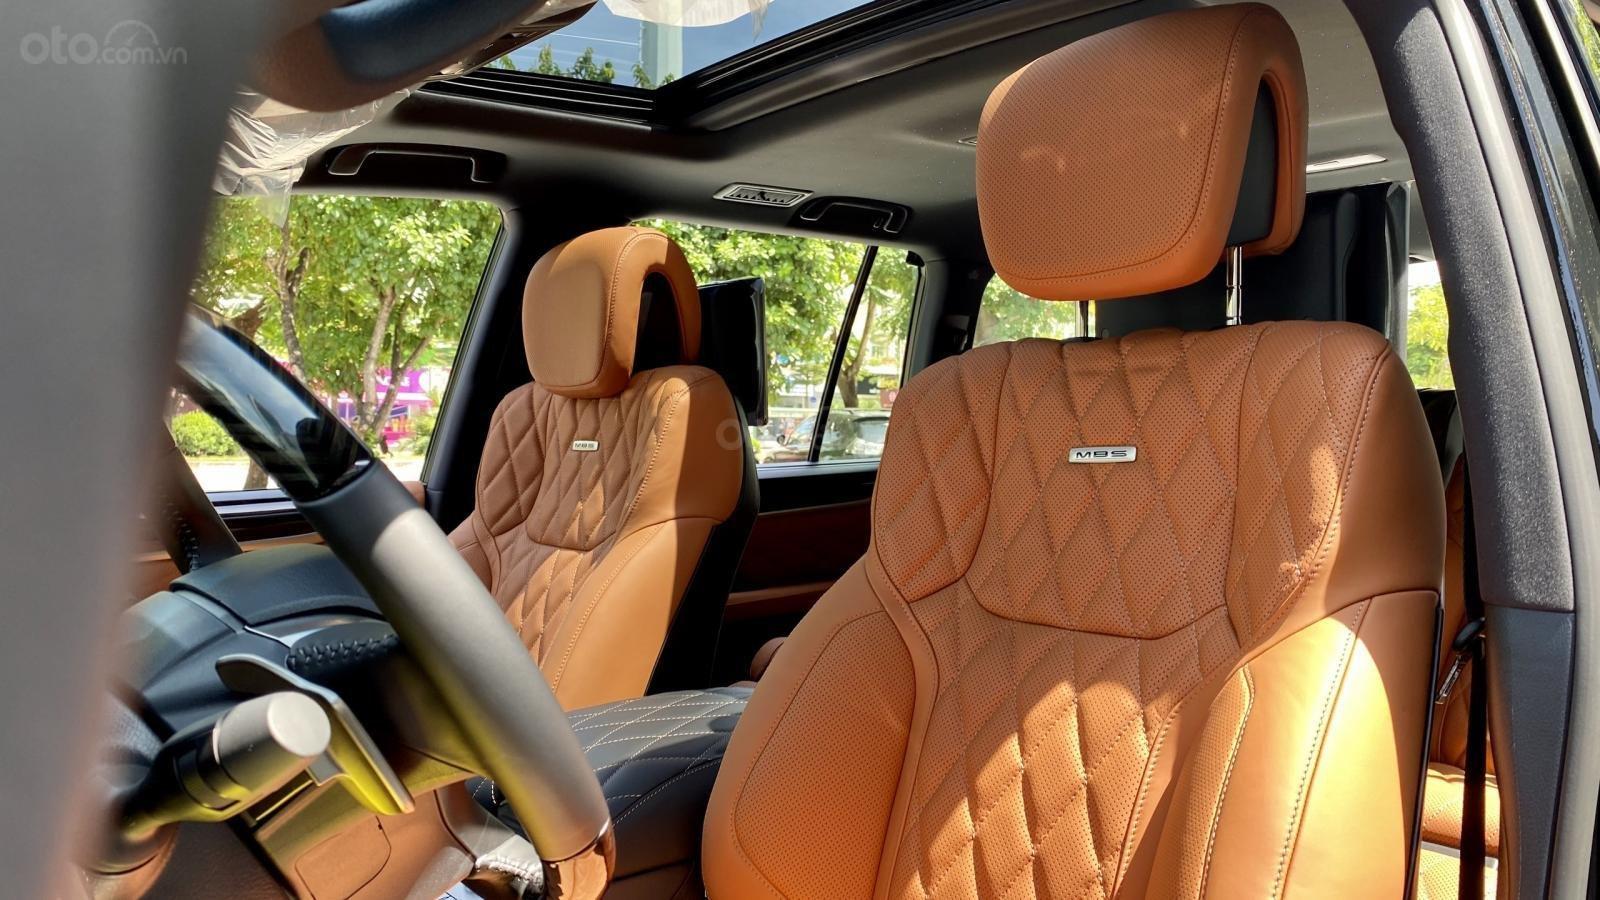 Bán ô tô Lexus LX 570S Super Sport MBS 4 ghế SX 2020, full trần sao, xe mới 100% (15)